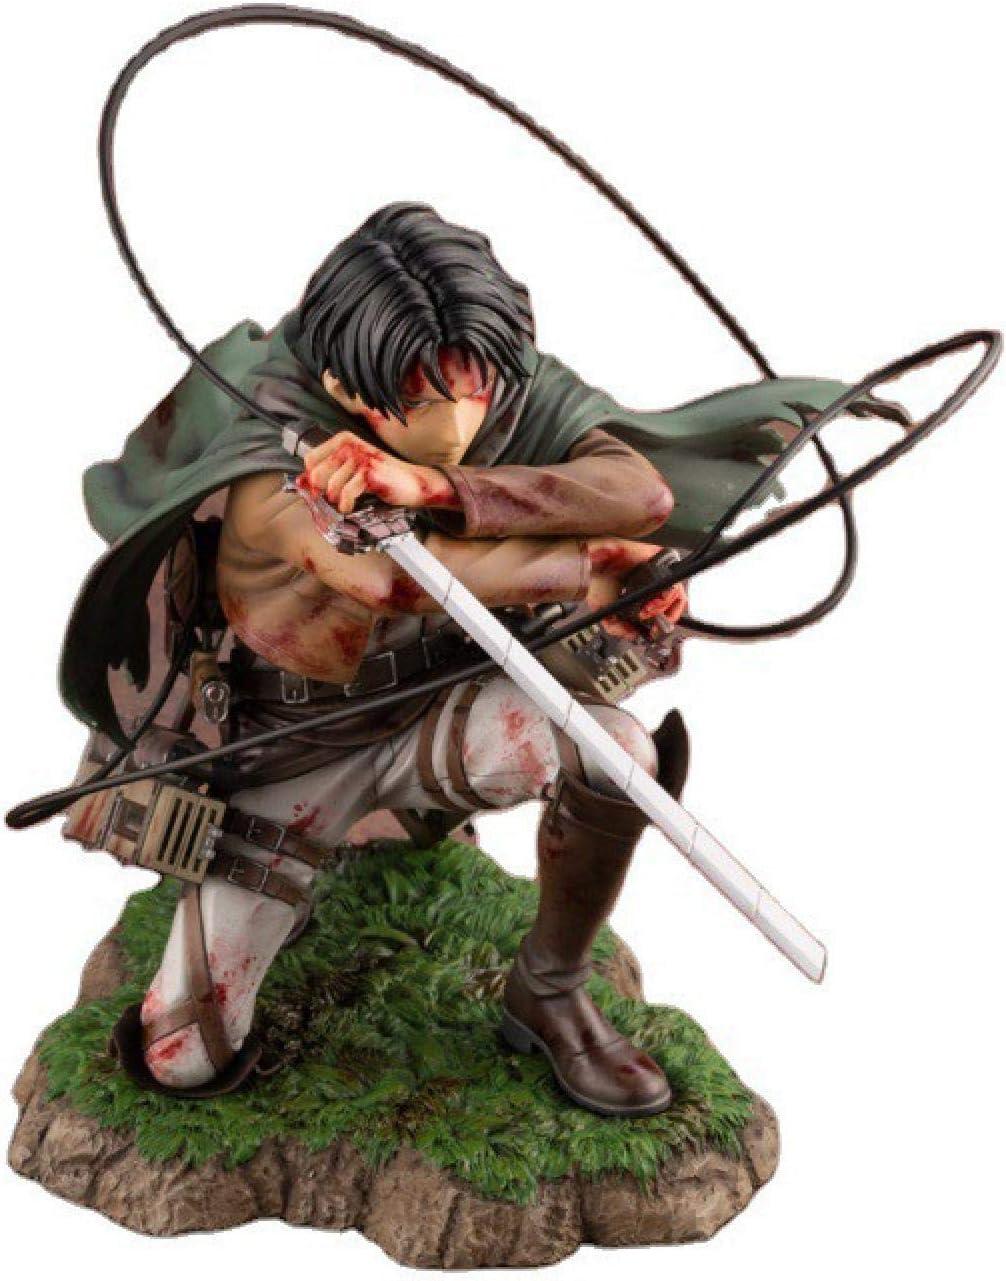 Attack on Titan Levi//Rivaille Figure Rival Ackerman Action Figure 15CM new